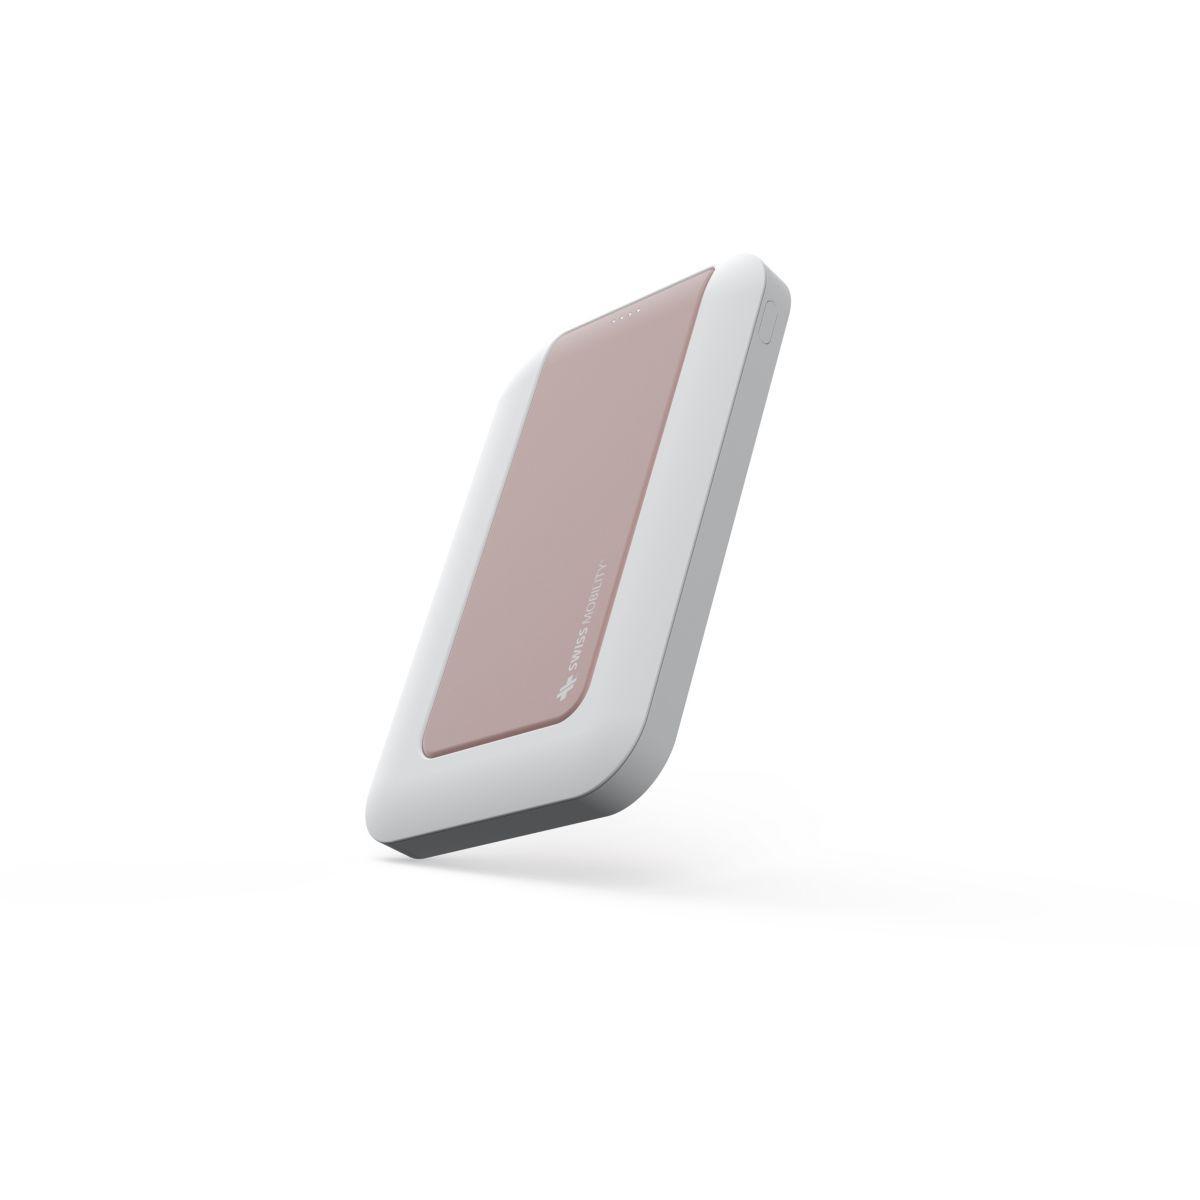 Batterie externe swiss mobility 4000 mah rose gold - 2.4a fast charge - 5% de remise imm�diate avec le code : deal5 (photo)